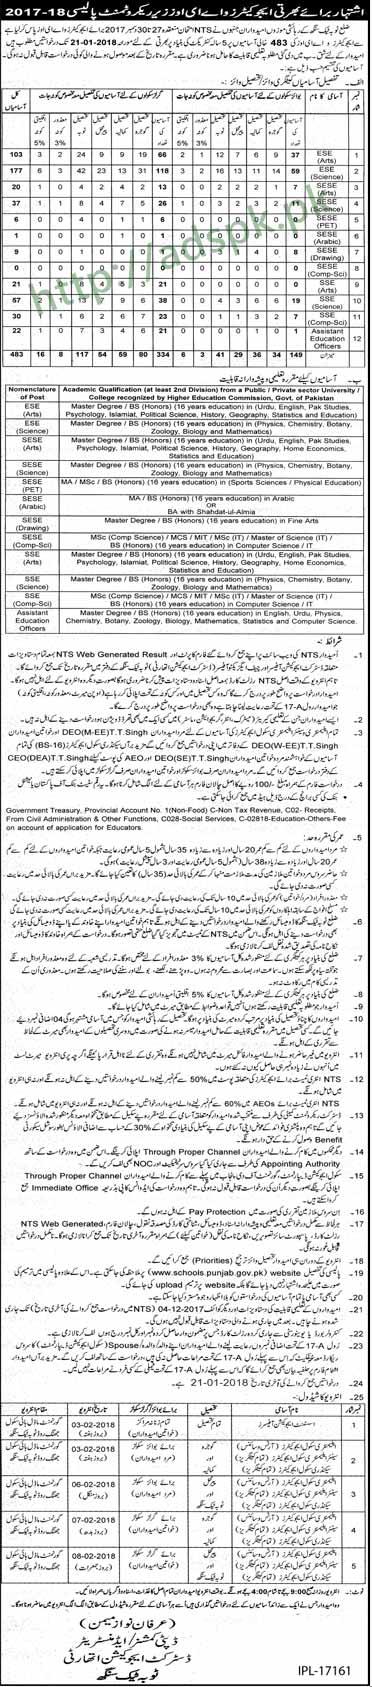 Punjab Educators District Toba Tek Singh Jobs 2018 Interview Schedule Educators AEOs Tehsil wise (483 Vacancies) Jobs Application Deadline 21-01-2018 Apply Now